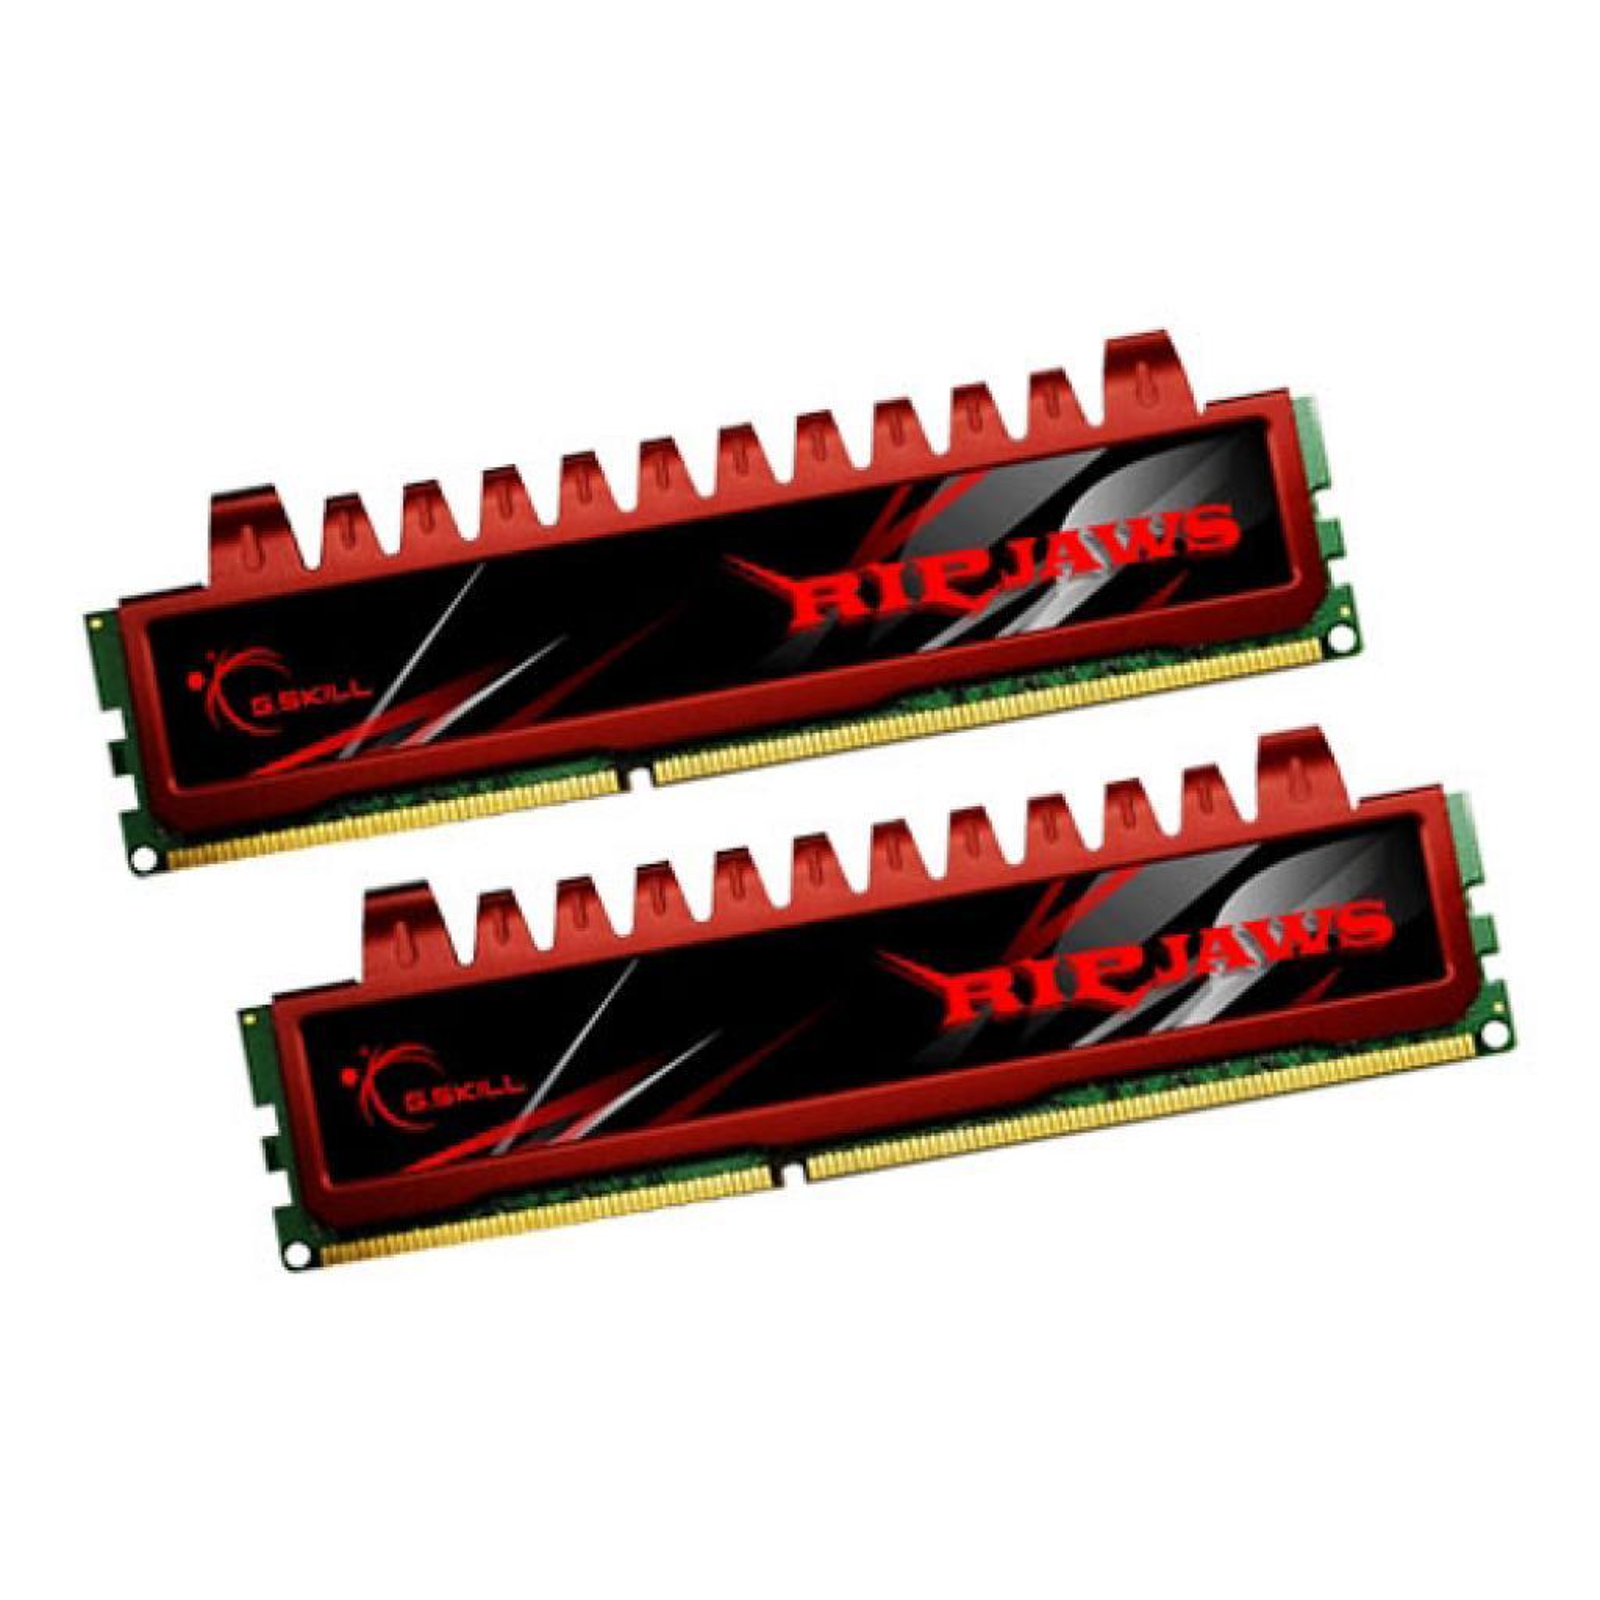 Модуль памяти для компьютера DDR3 8GB (2x4GB) 1333 MHz G.Skill (F3-10666CL9D-8GBXL)